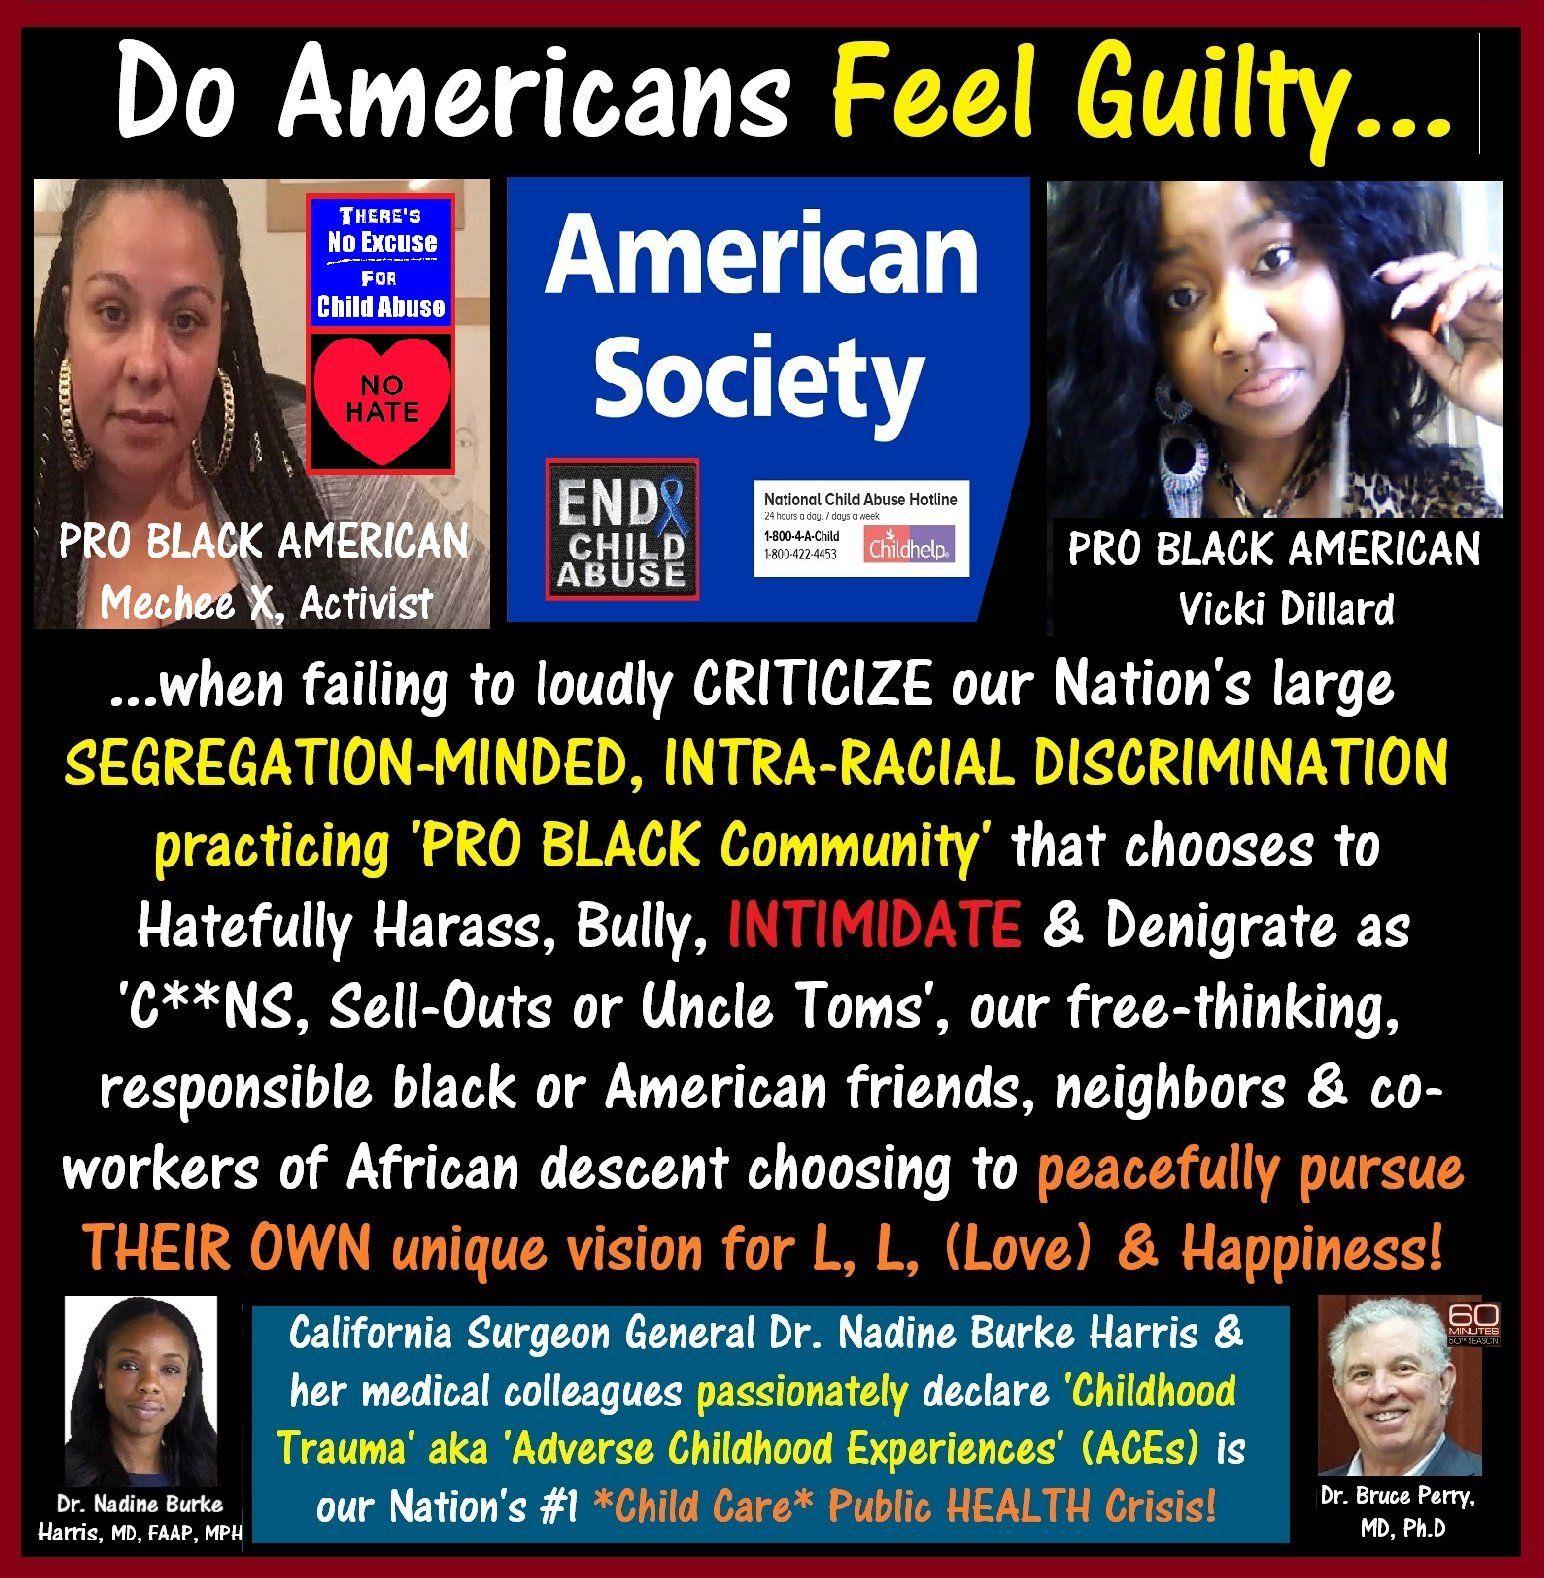 Unjustifiéd_White_Guilt.jpg